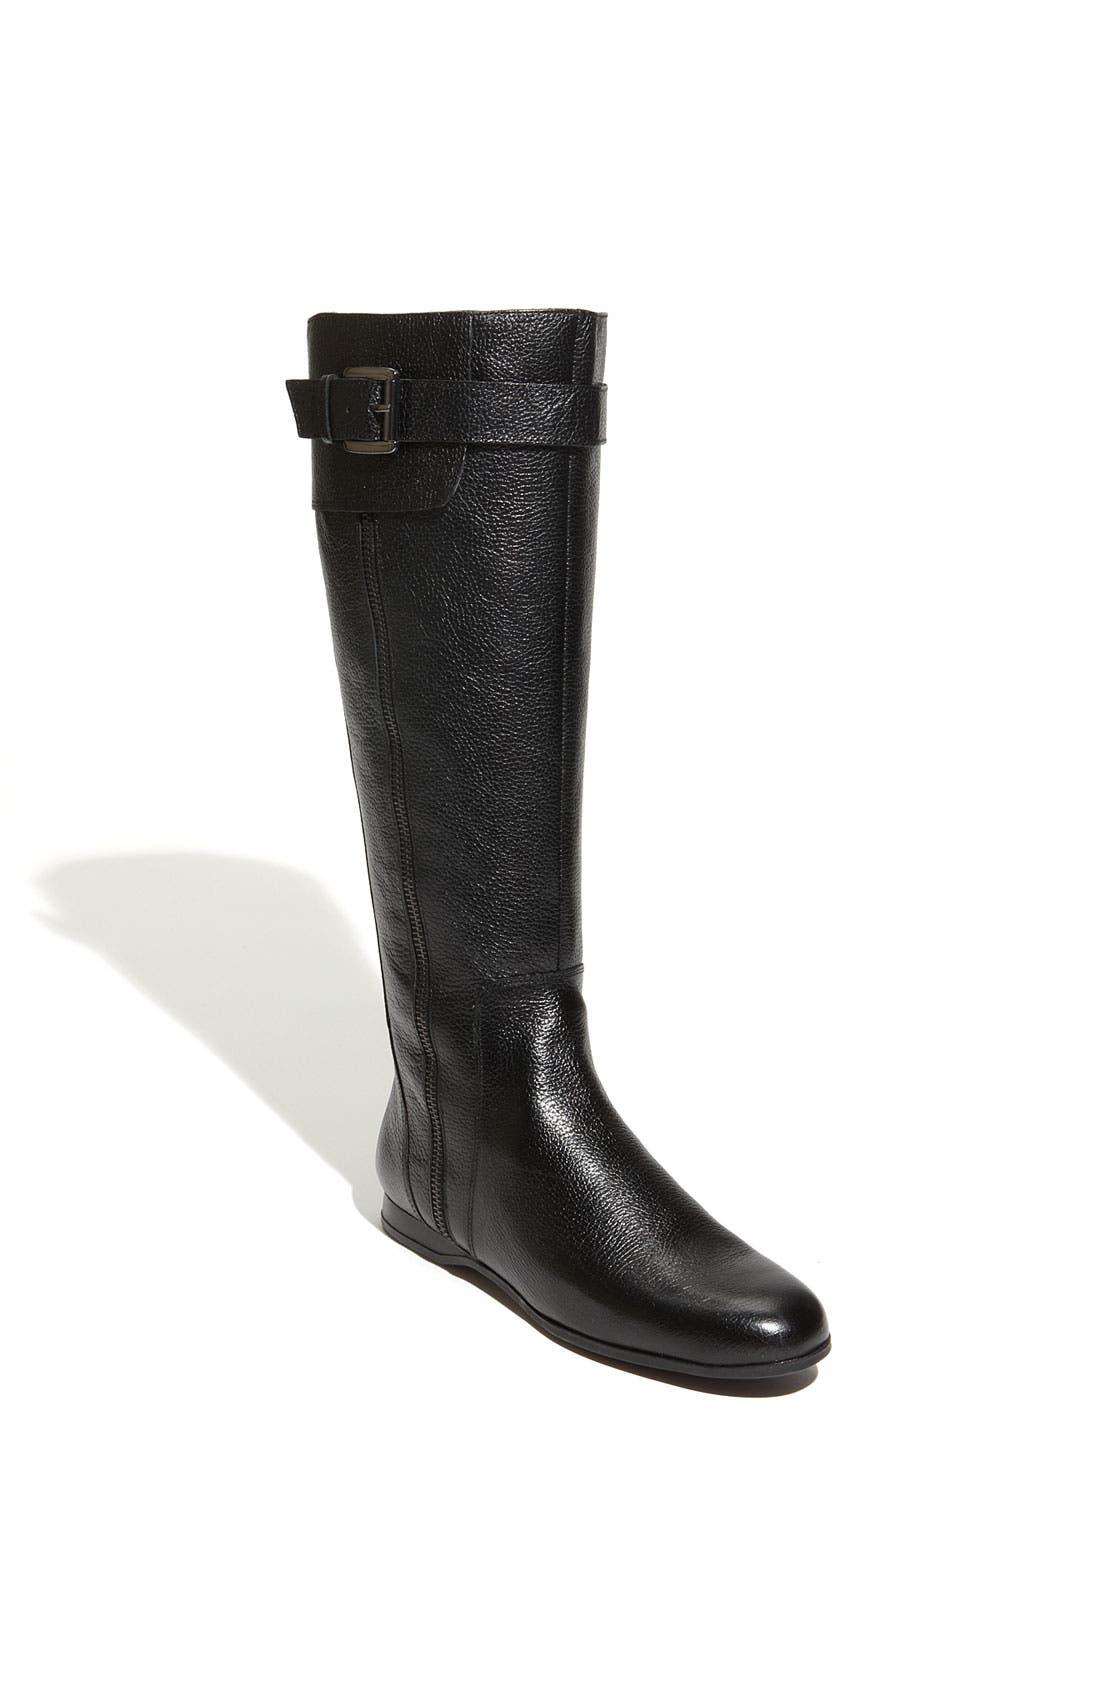 Alternate Image 1 Selected - Enzo Angiolini 'Zayra' Boot